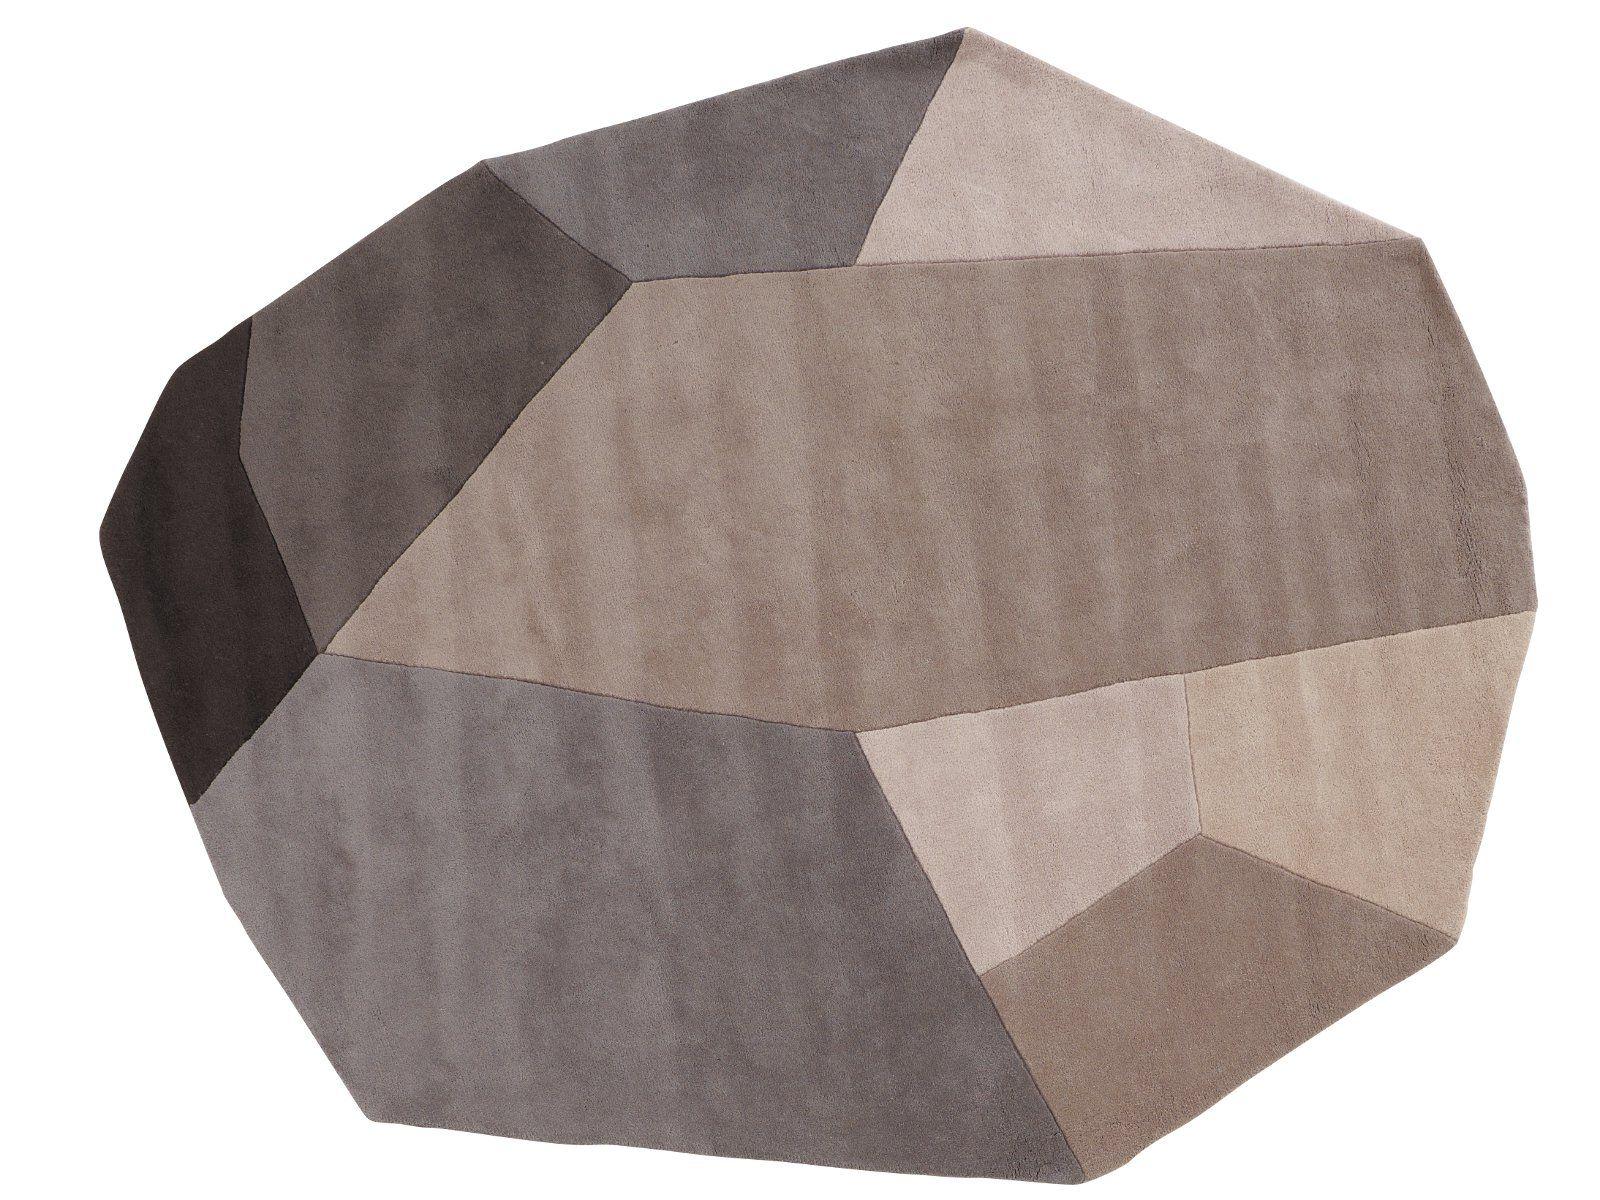 tappeto in lana menhir by roset italia design damaris marc. Black Bedroom Furniture Sets. Home Design Ideas